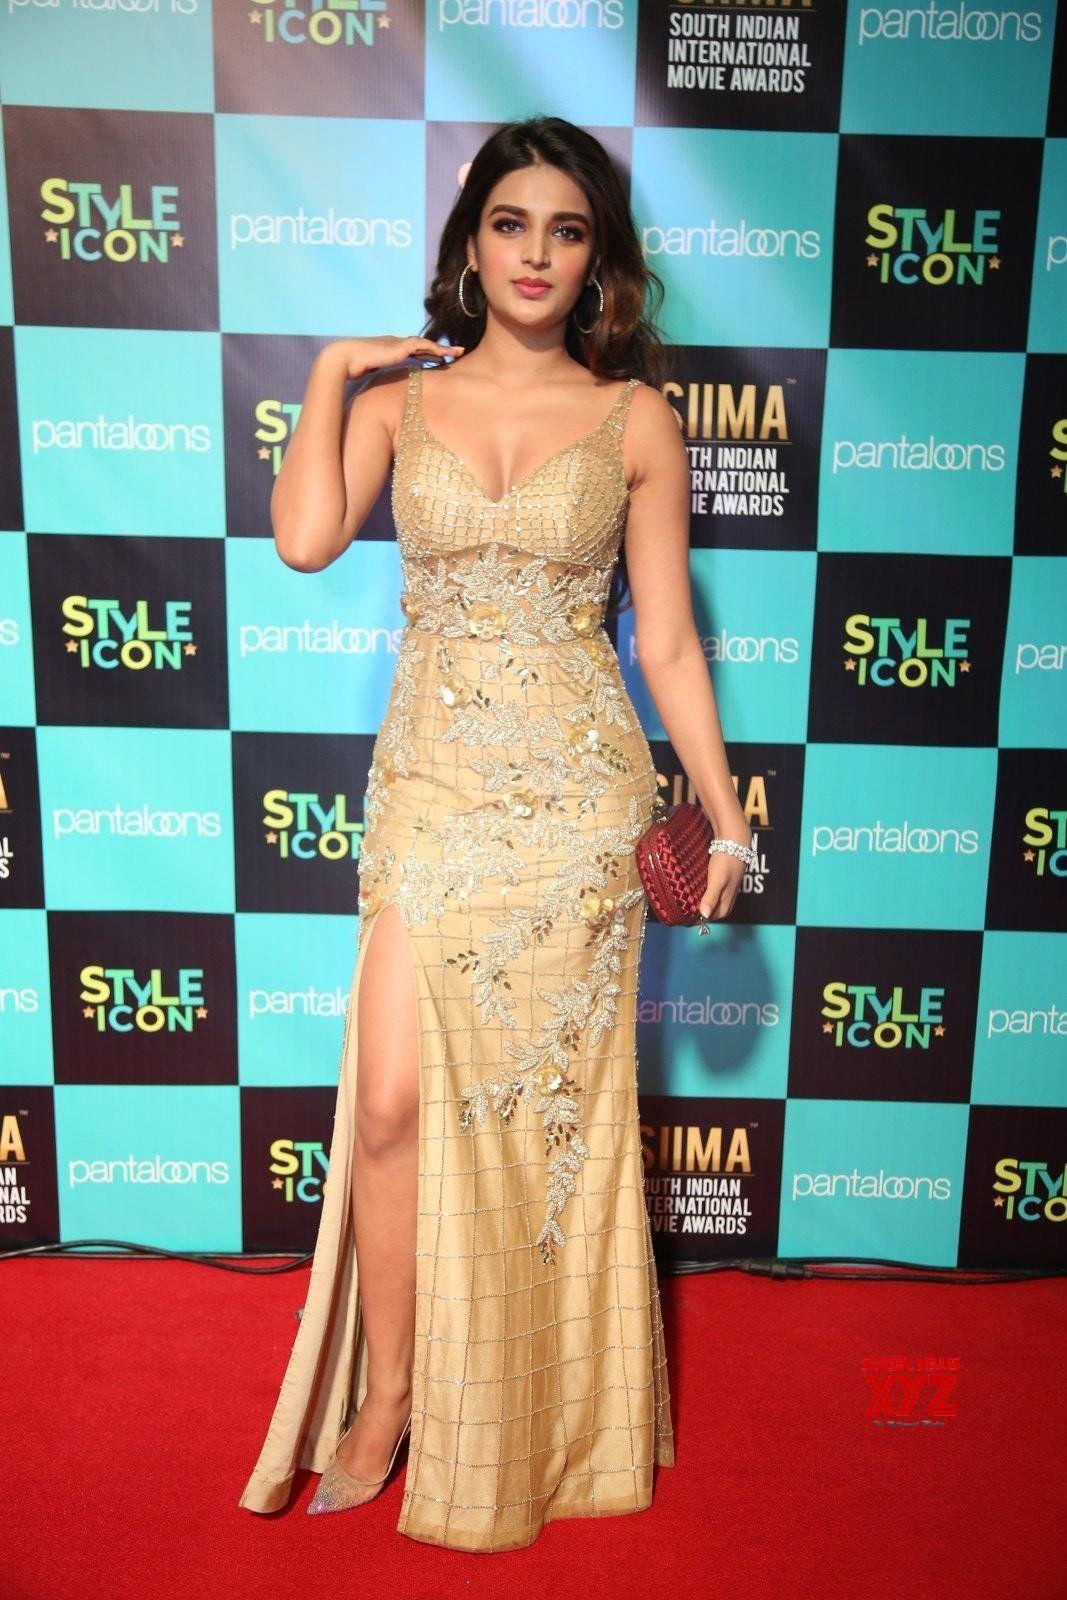 Actress Nidhhi Agerwal Hot Stills From Siima Awards 2019 Red Carpet Social News Xyz Bollywood Actress Hot Photos Beautiful Bollywood Actress Most Beautiful Indian Actress